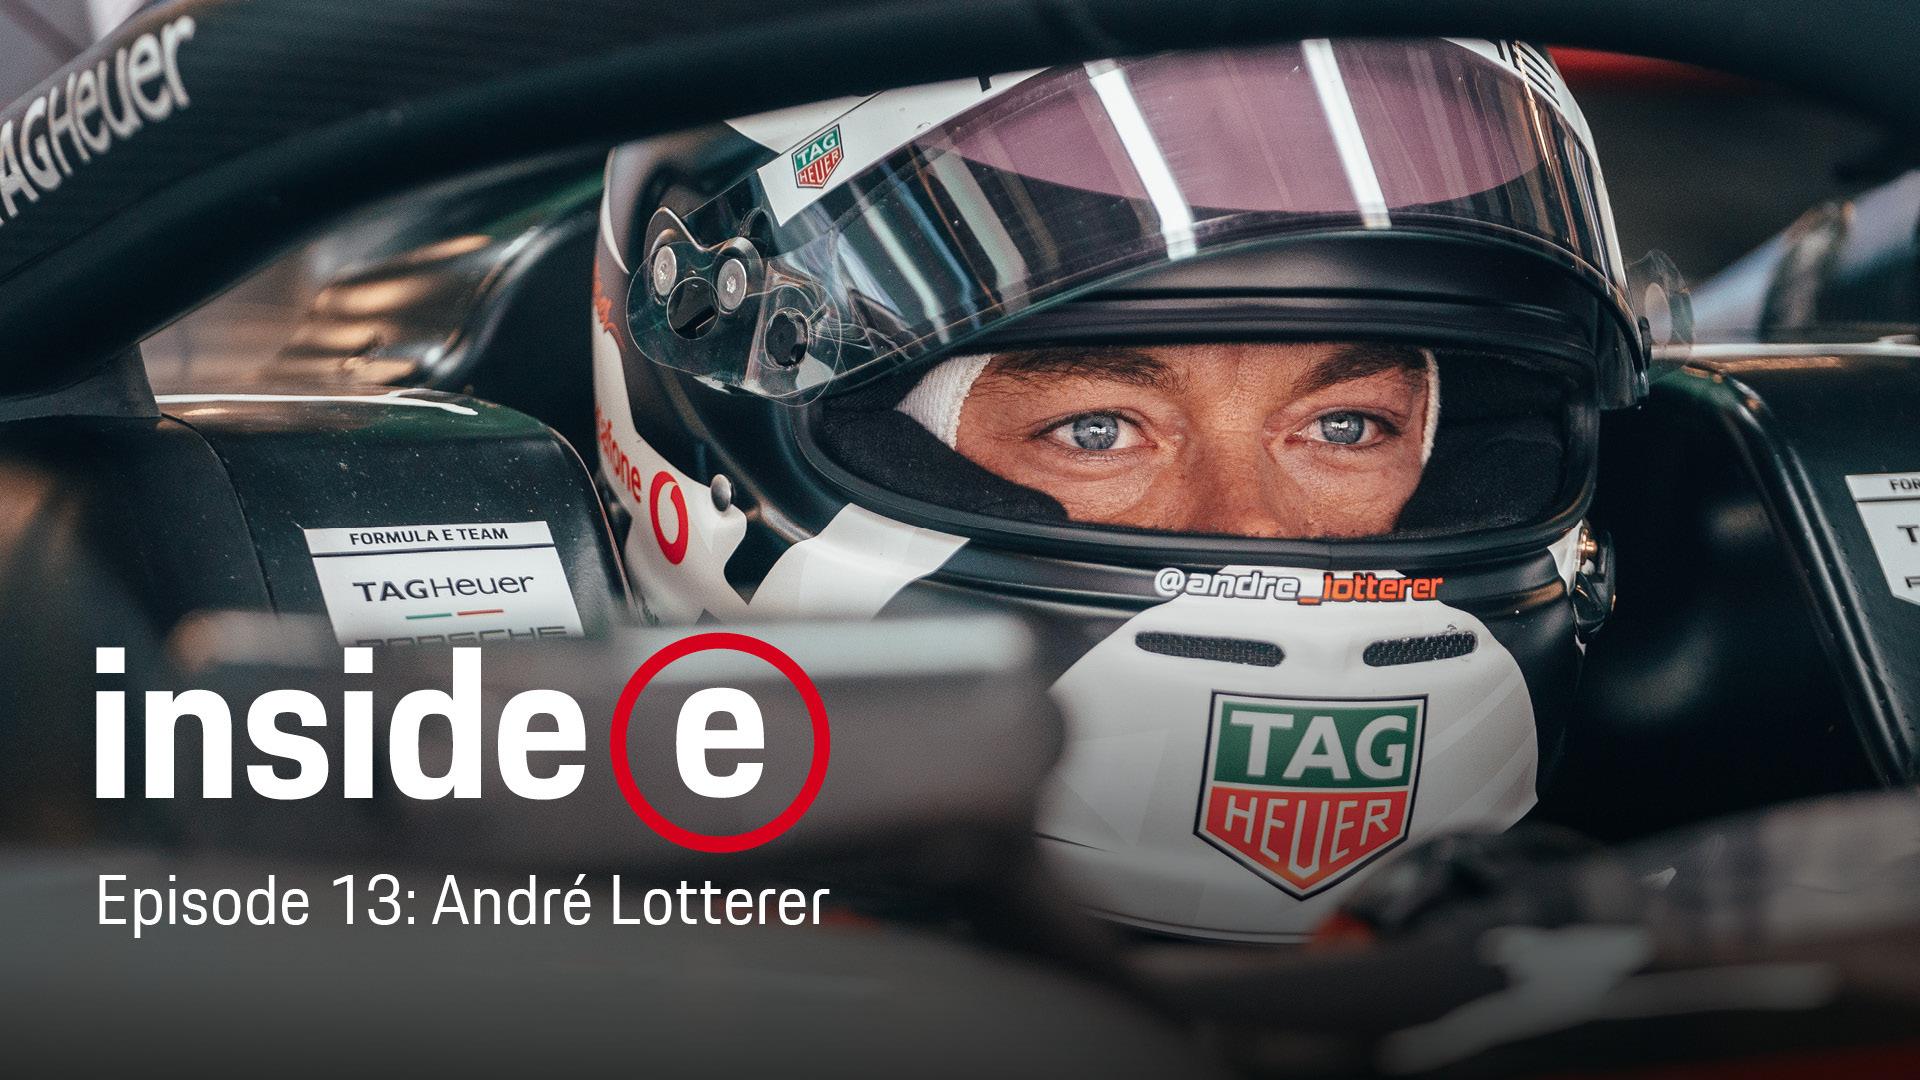 Porsche Formula E 最新 Podcast 出爐:與 André Lotterer 回顧成功賽季